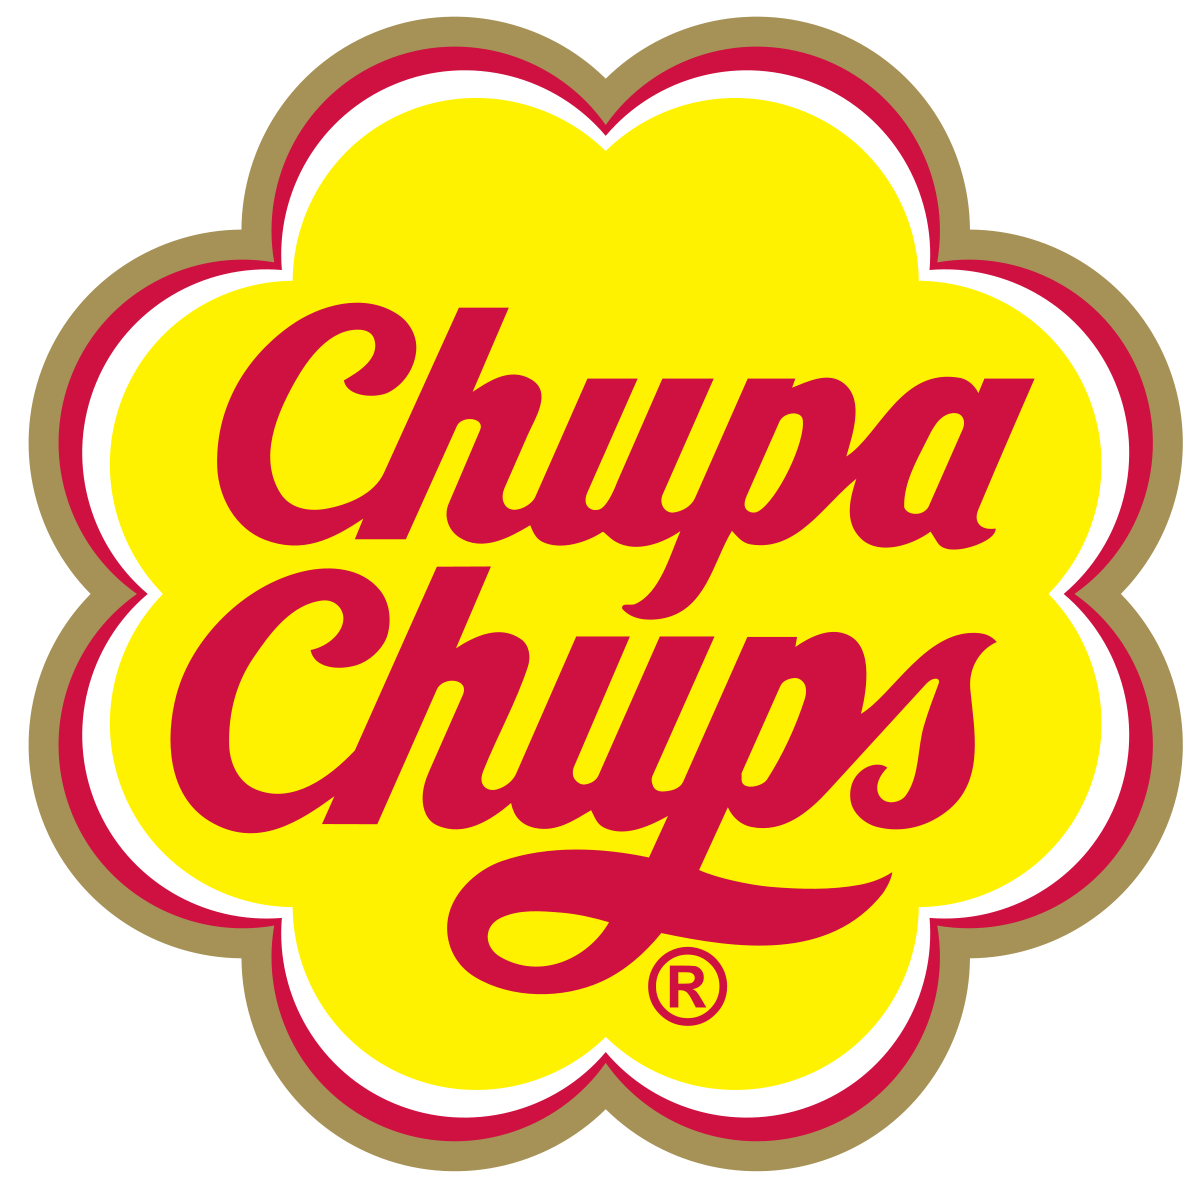 logo facts chupa chups